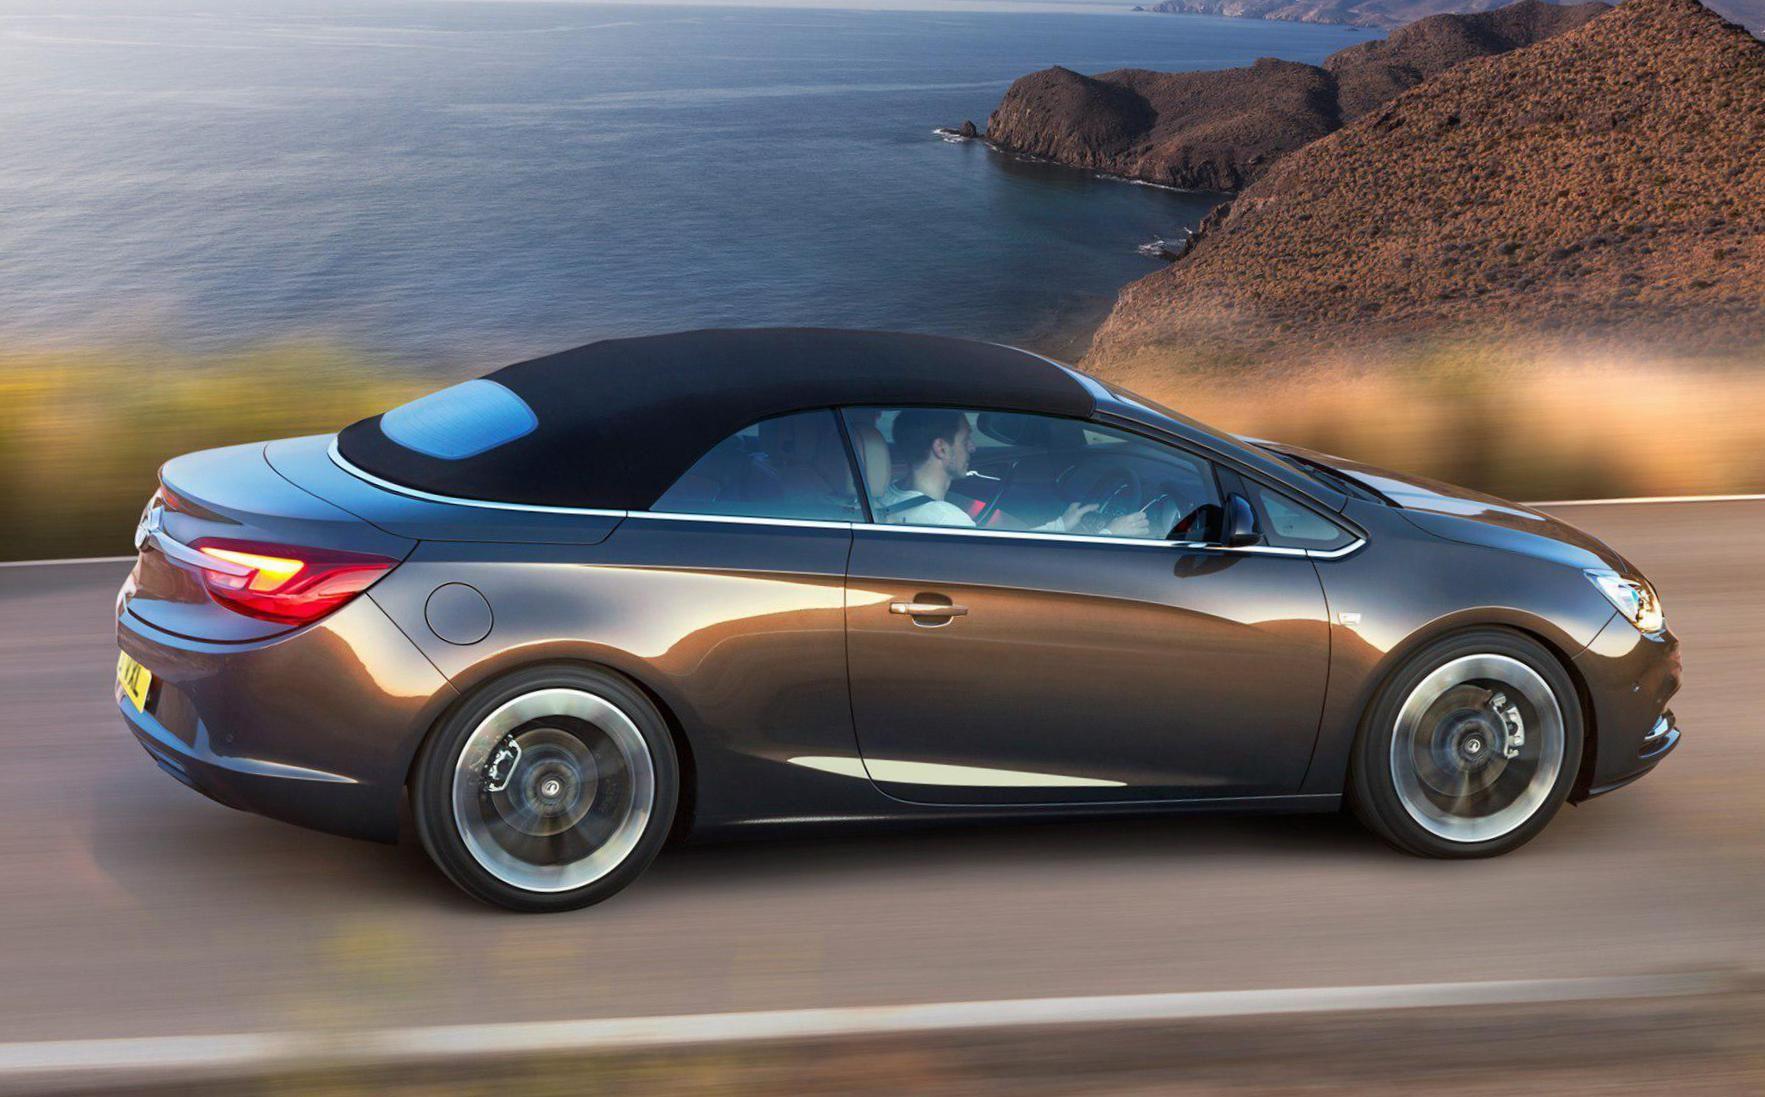 Opel Cascada Photos And Specs Photo Cascada Opel Configuration And 25 Perfect Photos Of Opel Cascada Vauxhall Vauxhall Motors Chrysler 200